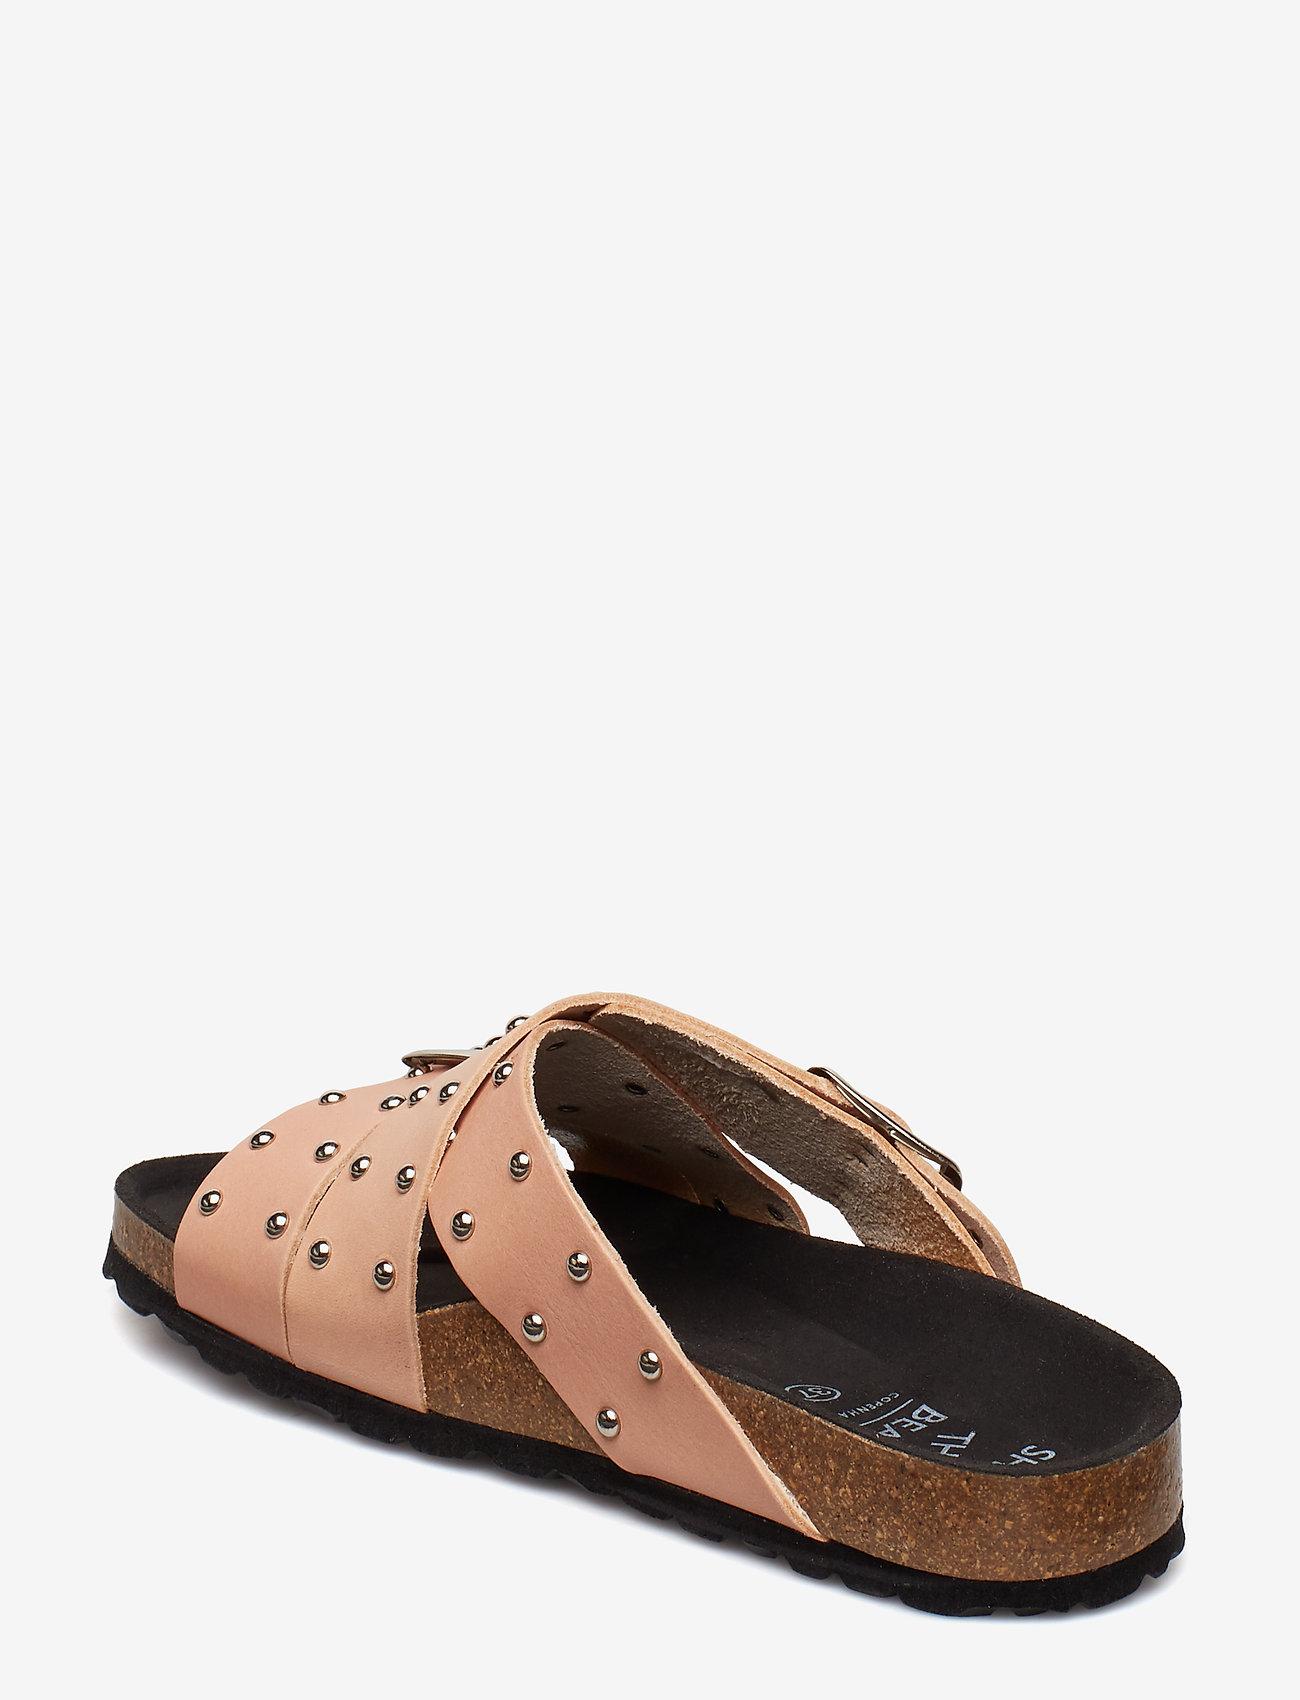 Cara Cross Studs (Tan) - Shoe The Bear